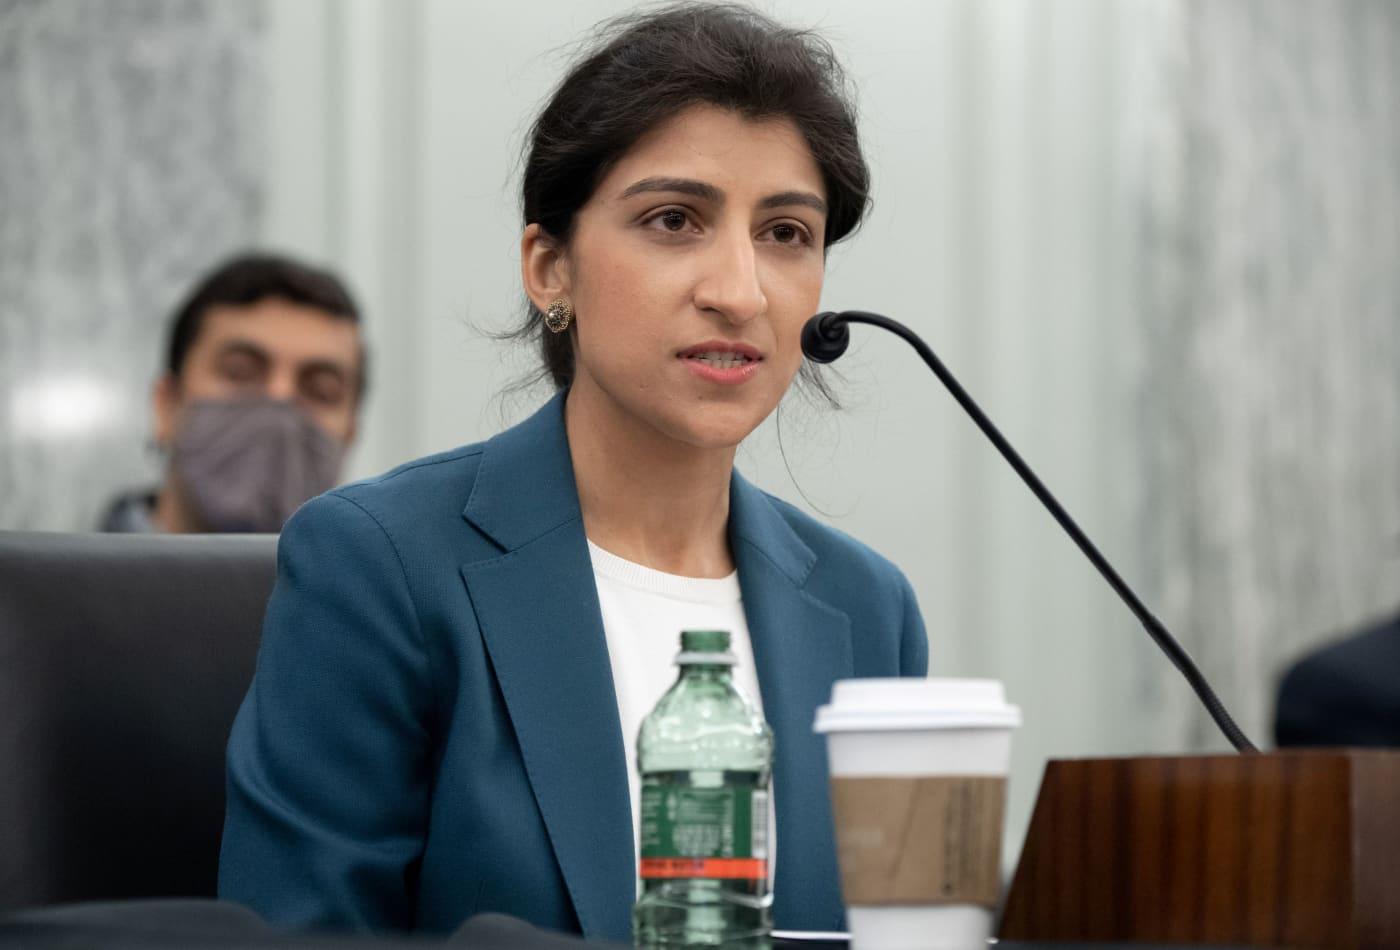 Senate confirms progressive tech critic Lina Khan to become an FTC commissioner